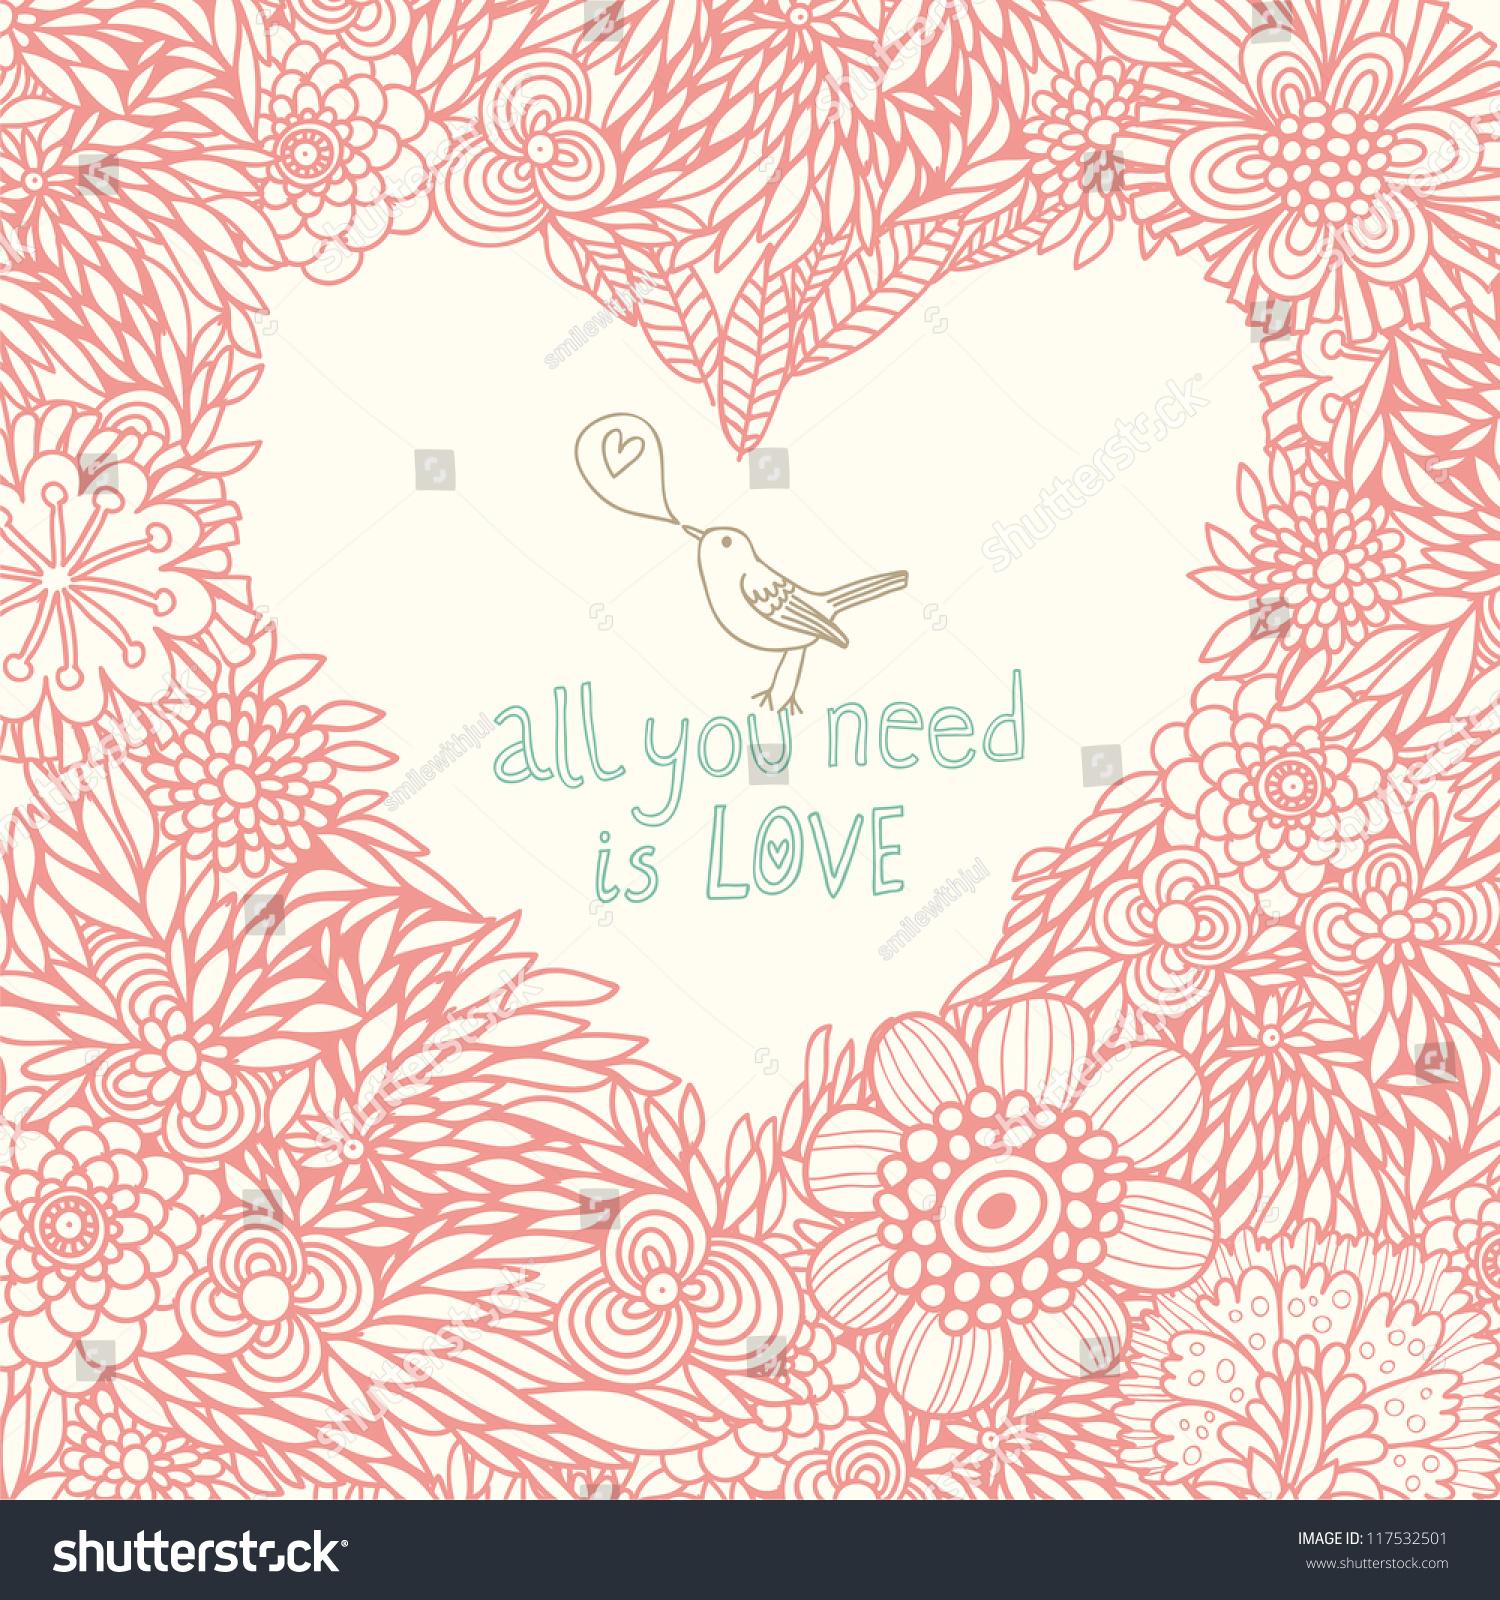 Romantic Wallpaper Cute Floral Background Vintage Stock ...